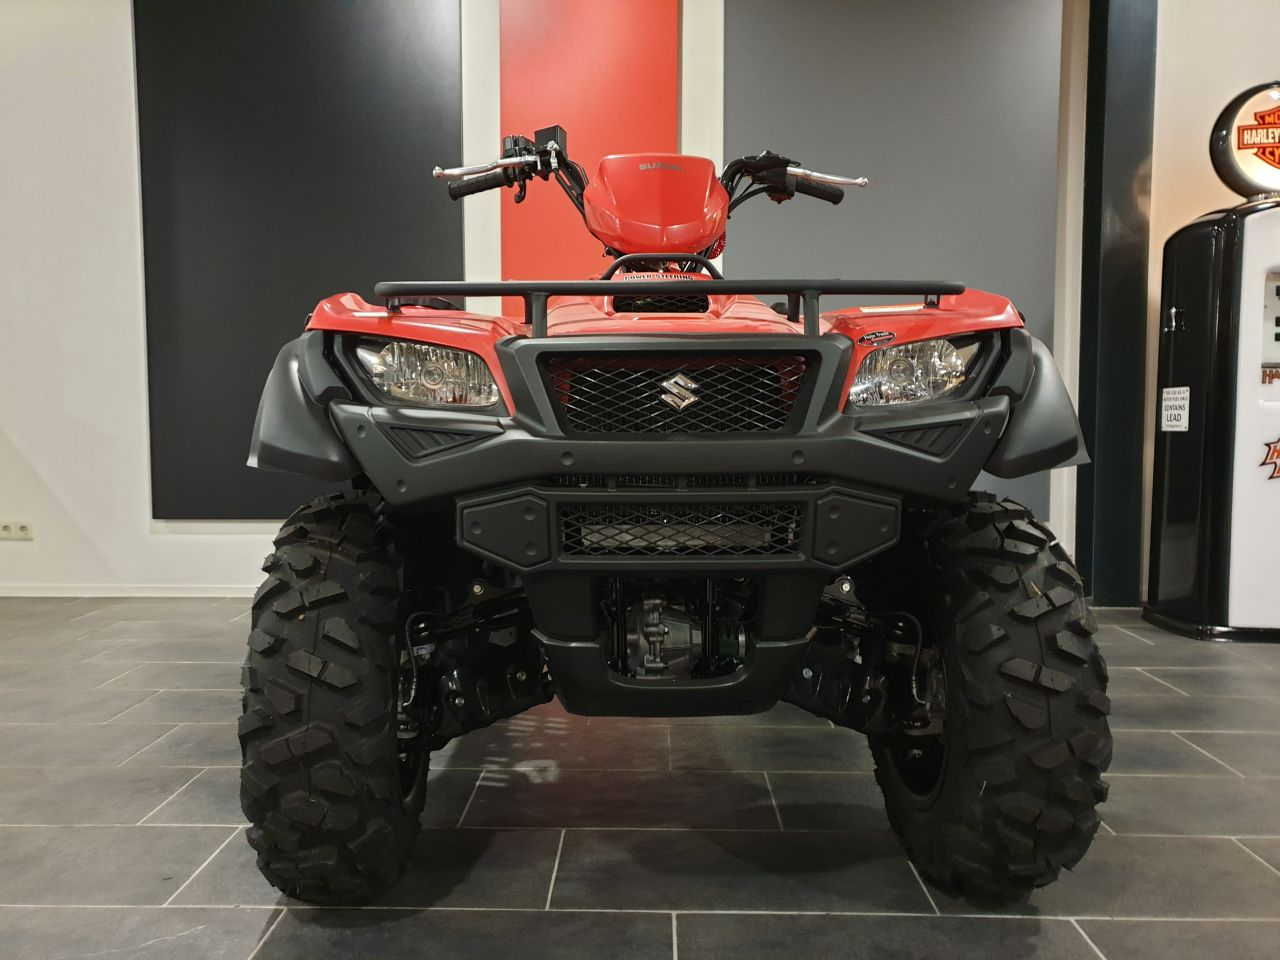 Suzuki Kingquad LTA750 EPS AXi (2016, nieuw!) - landbouwquad